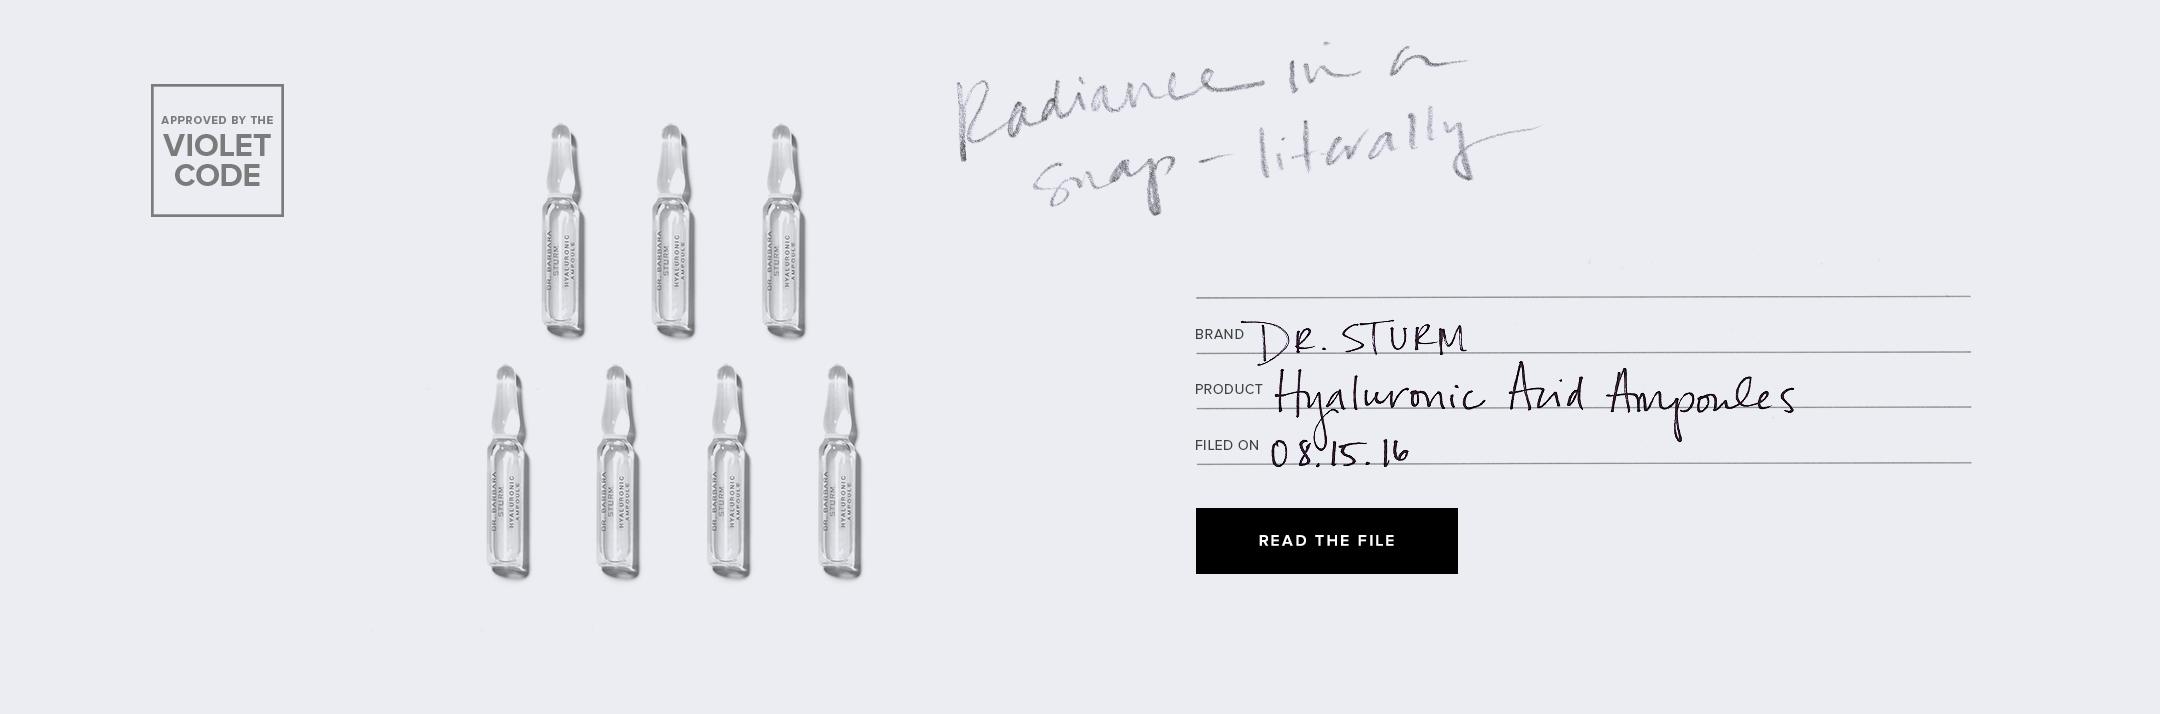 dr-barbara-sturm-hyaluronic-acid-ampoules-interstitial-darkBG.jpg